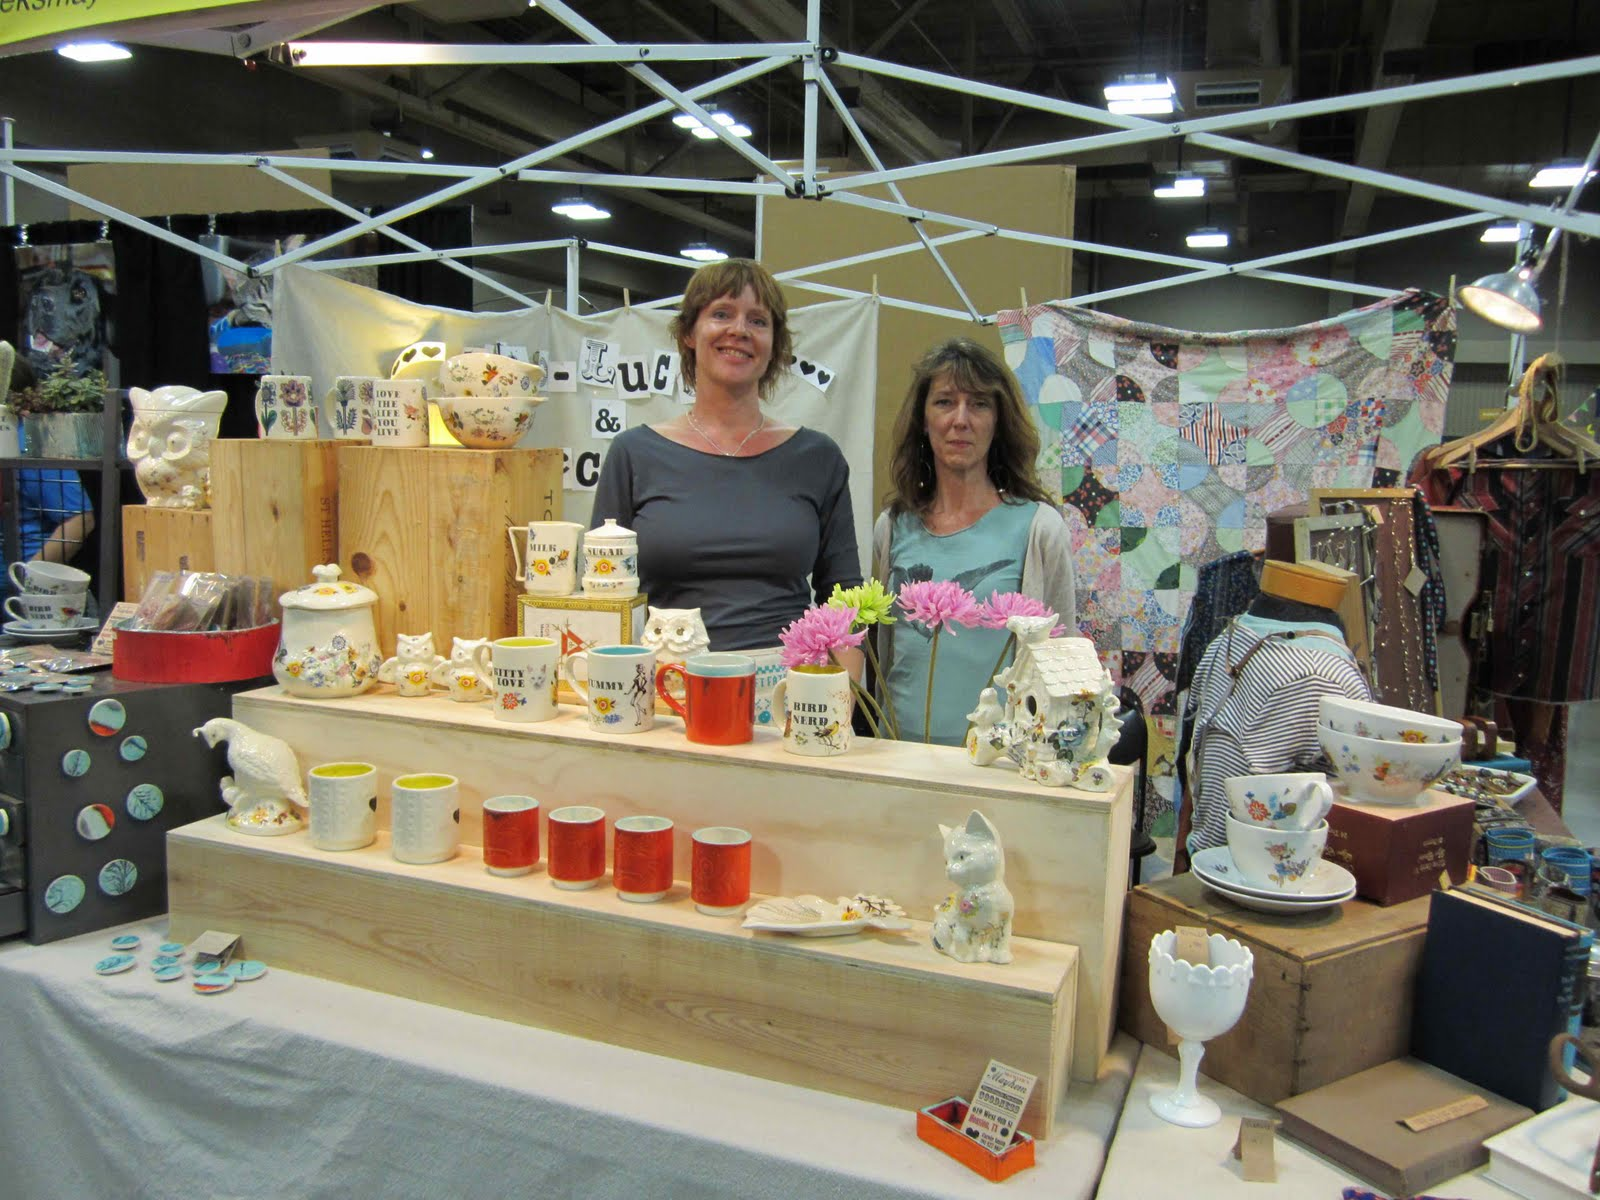 Houston center for contemporary craft blog belated report for Houston center for contemporary craft